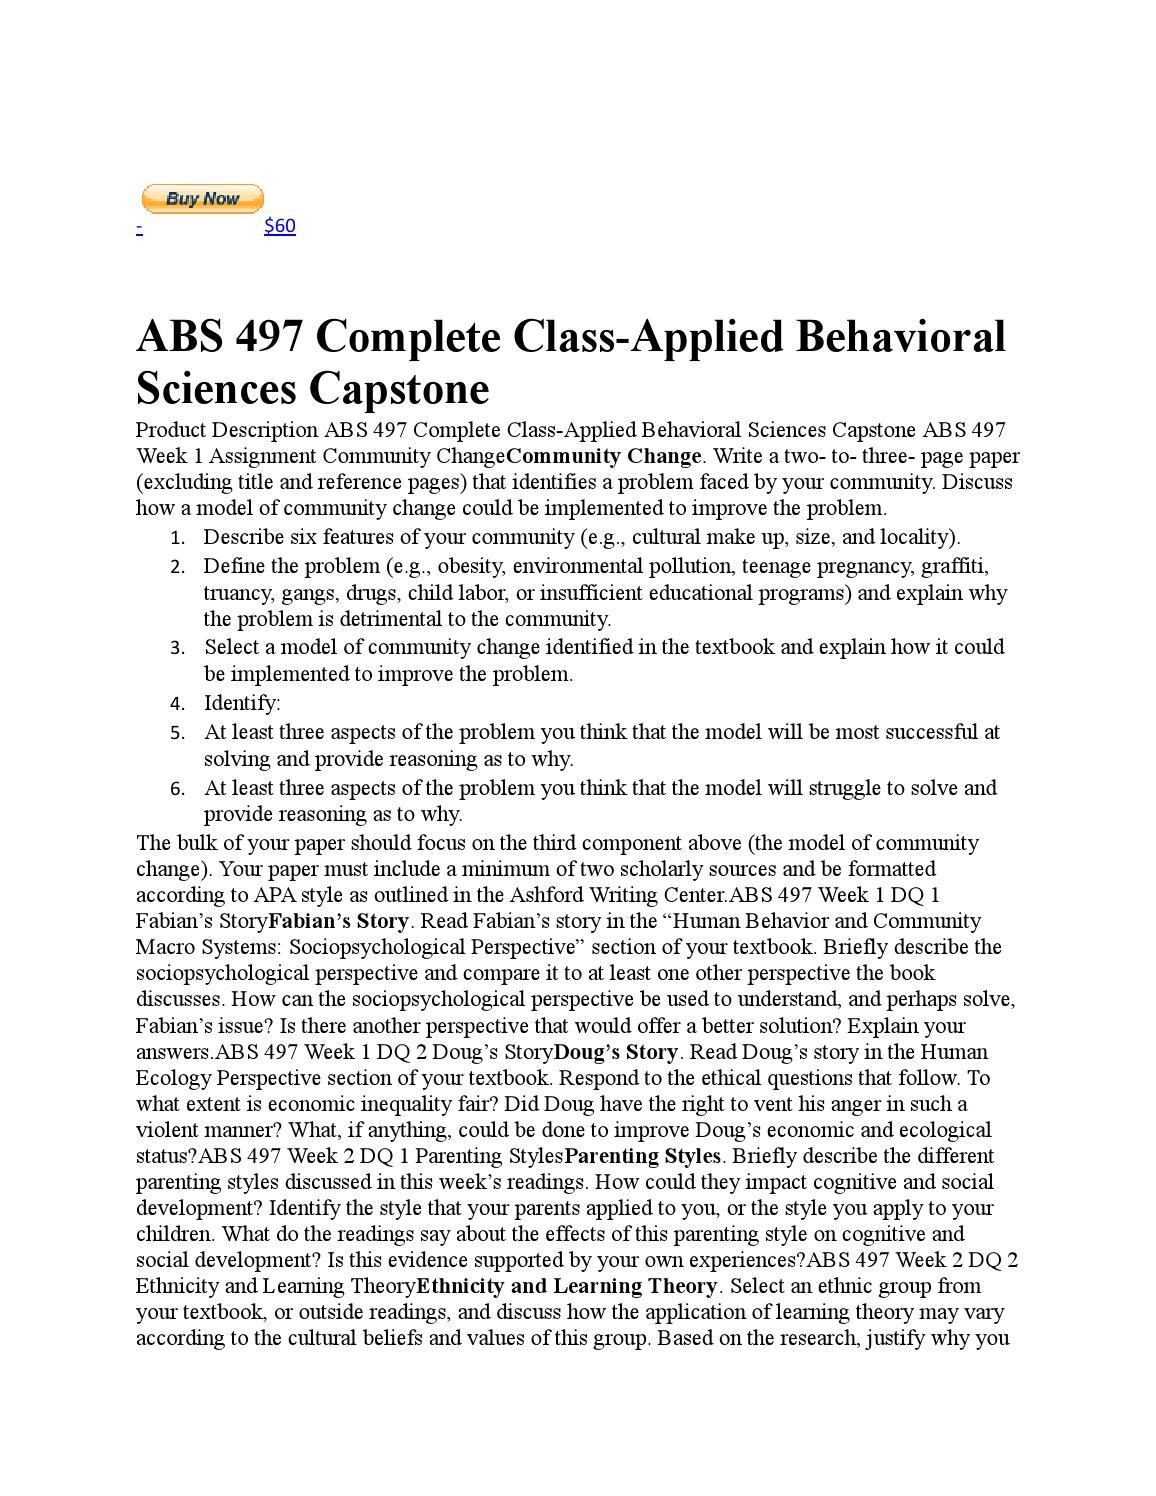 ABS 497 Applied Behavioral Sciences Capstone Project Assistance